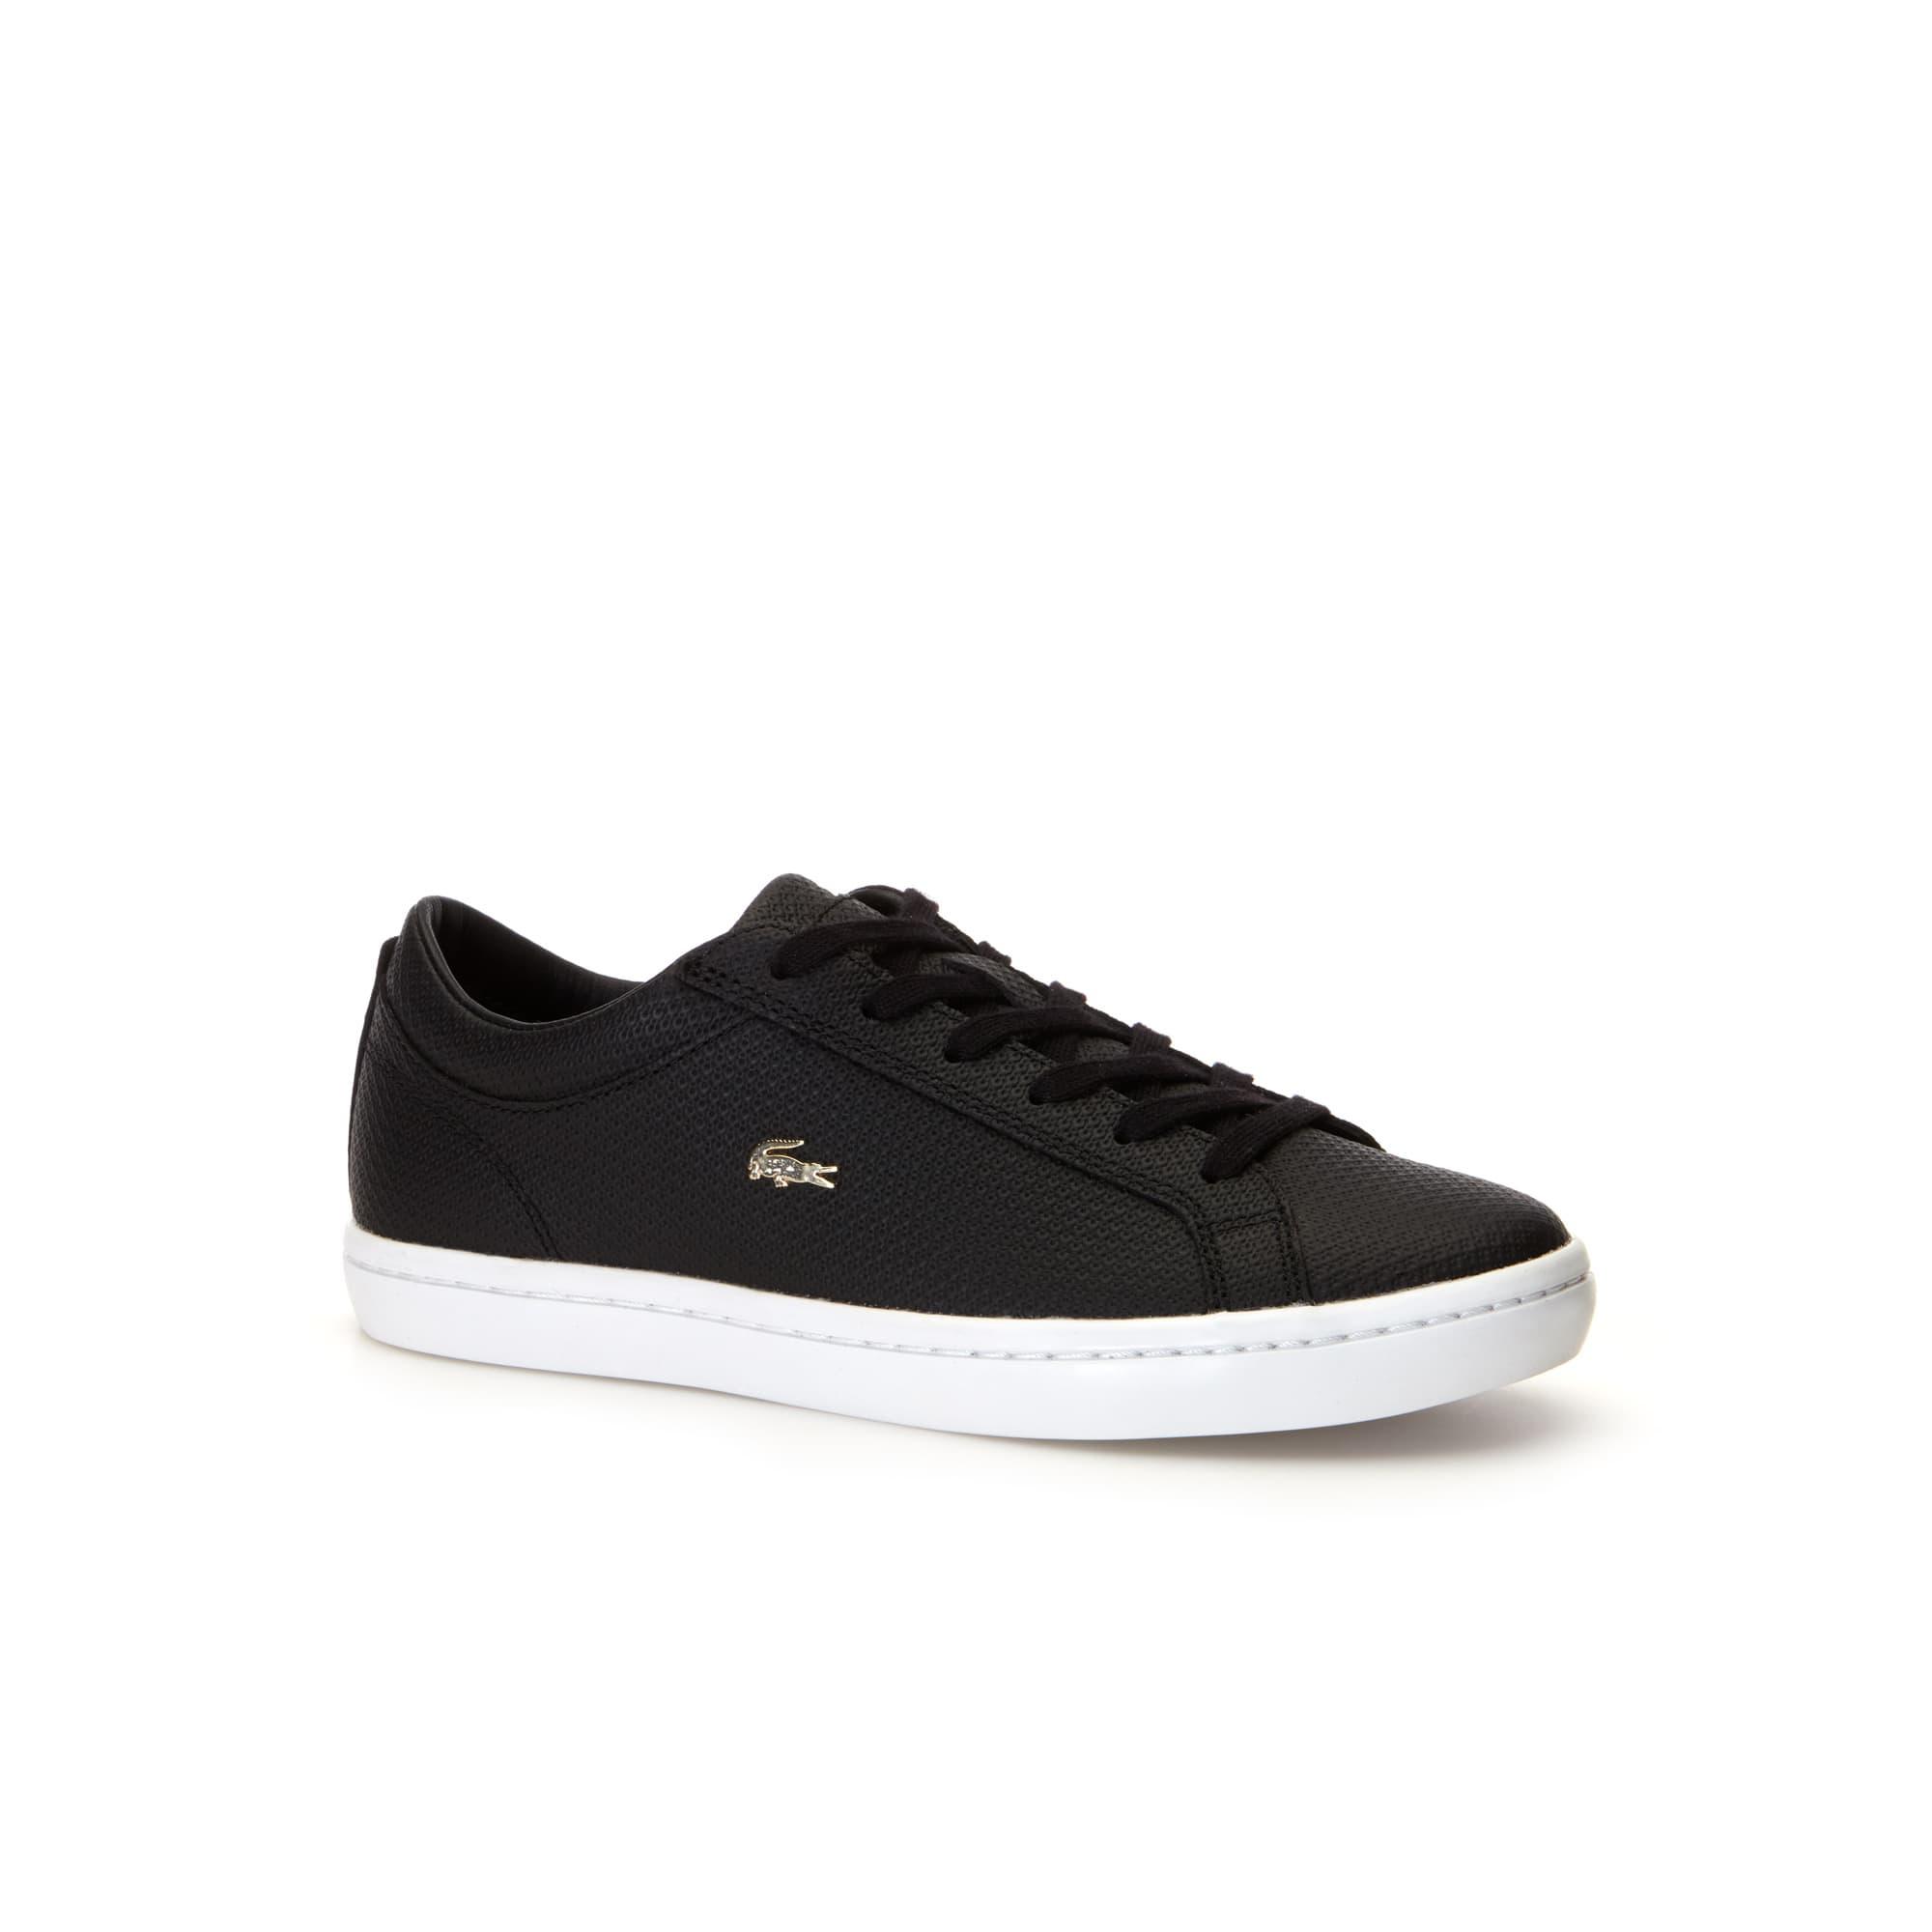 Schuhe Lacoste da Damens  sneaker, stivali, da città LACOSTE  LACOSTE città 38266c